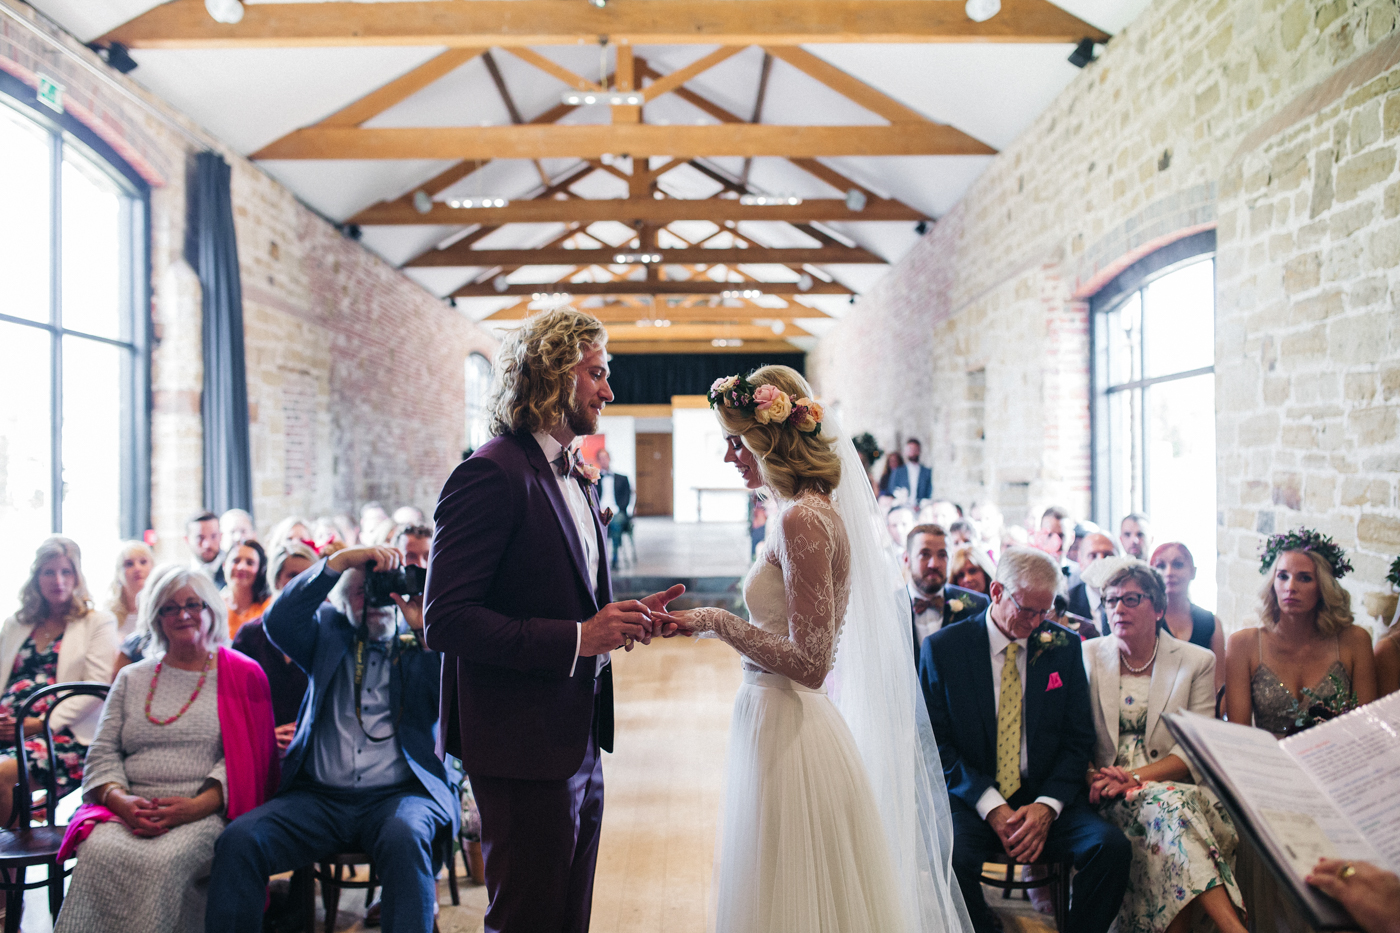 bentley-wildfowl-motor-museum-wedding-photographer-lewes-brighton-east-sussex-0015.jpg